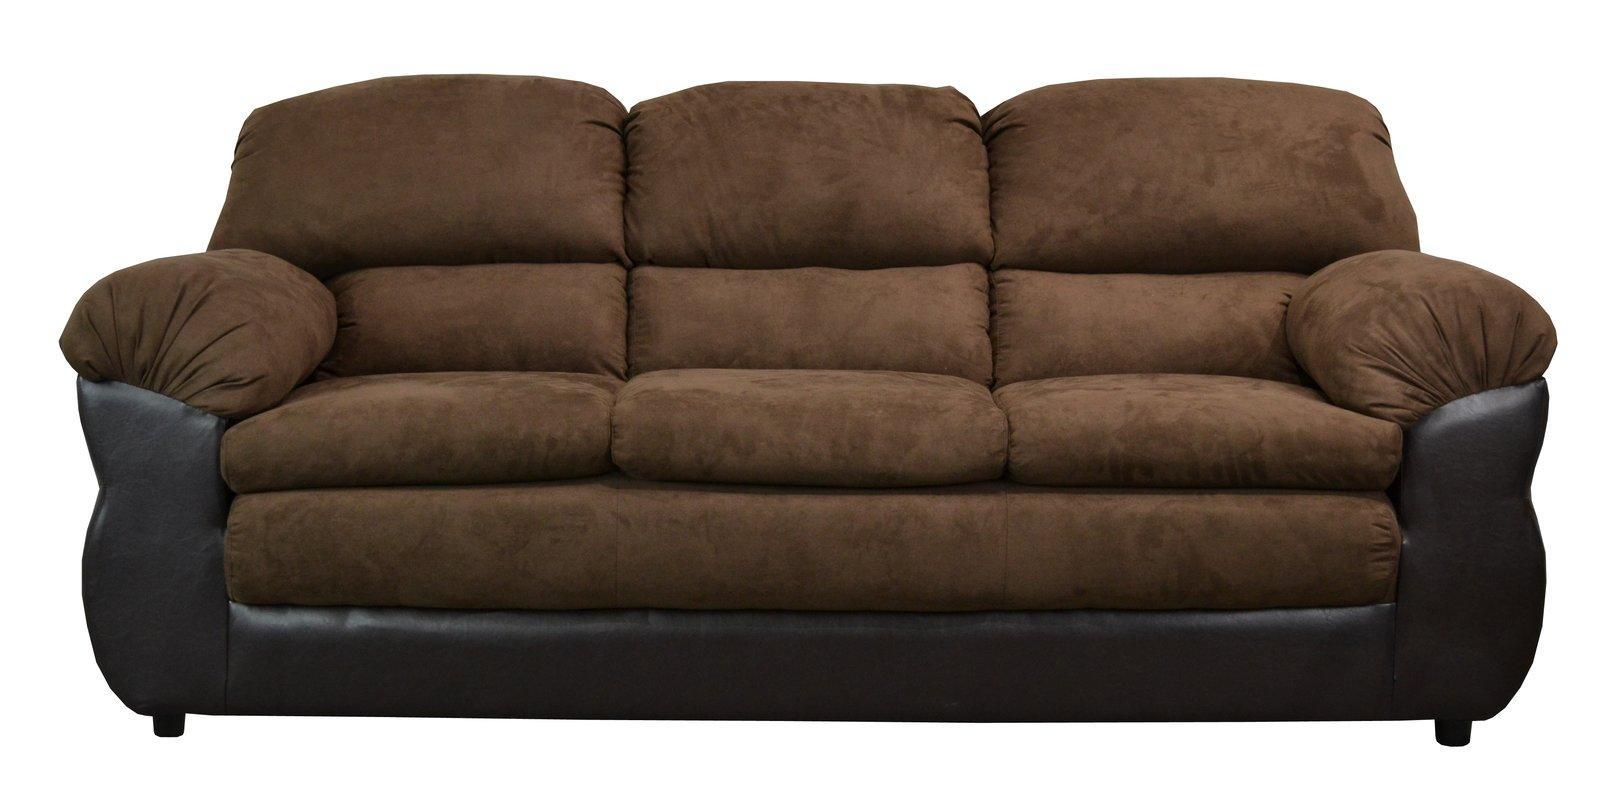 Piedmont Furniture Abigail Sofa & Reviews | Wayfair Throughout Piedmont Sofas (View 5 of 20)